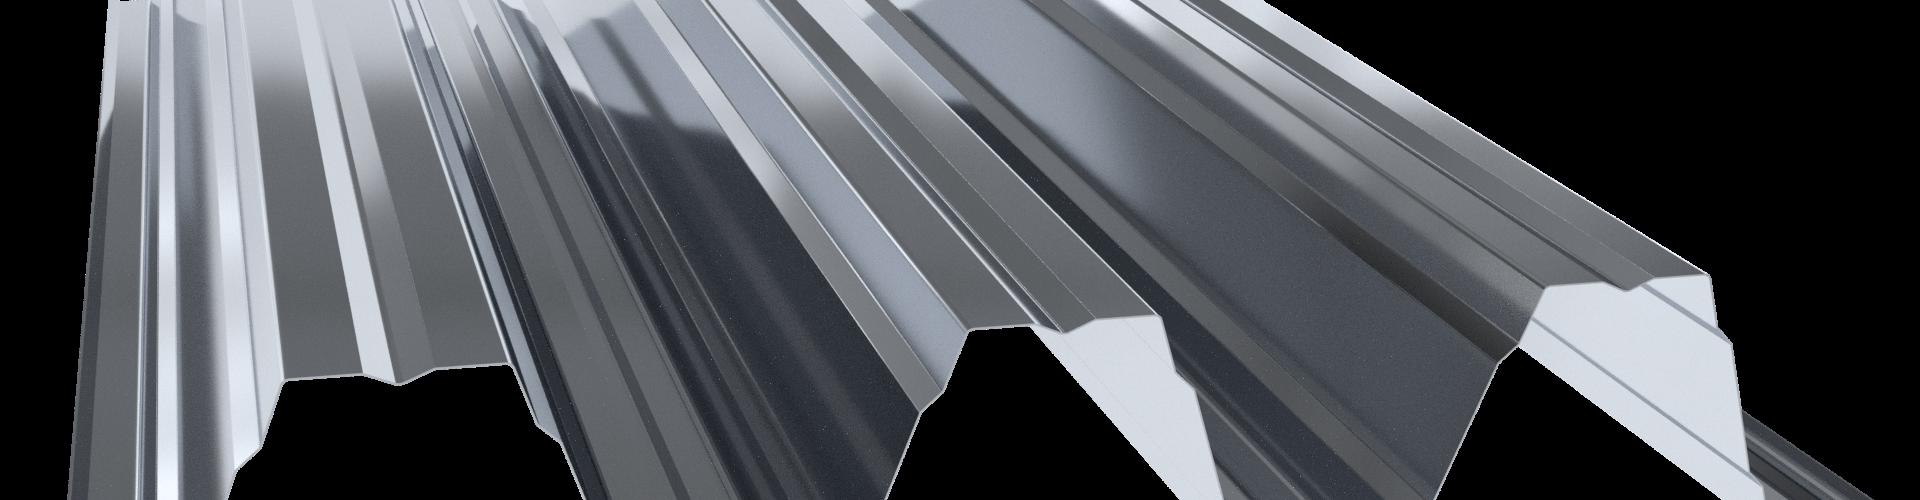 Konstruktionsprofil T150